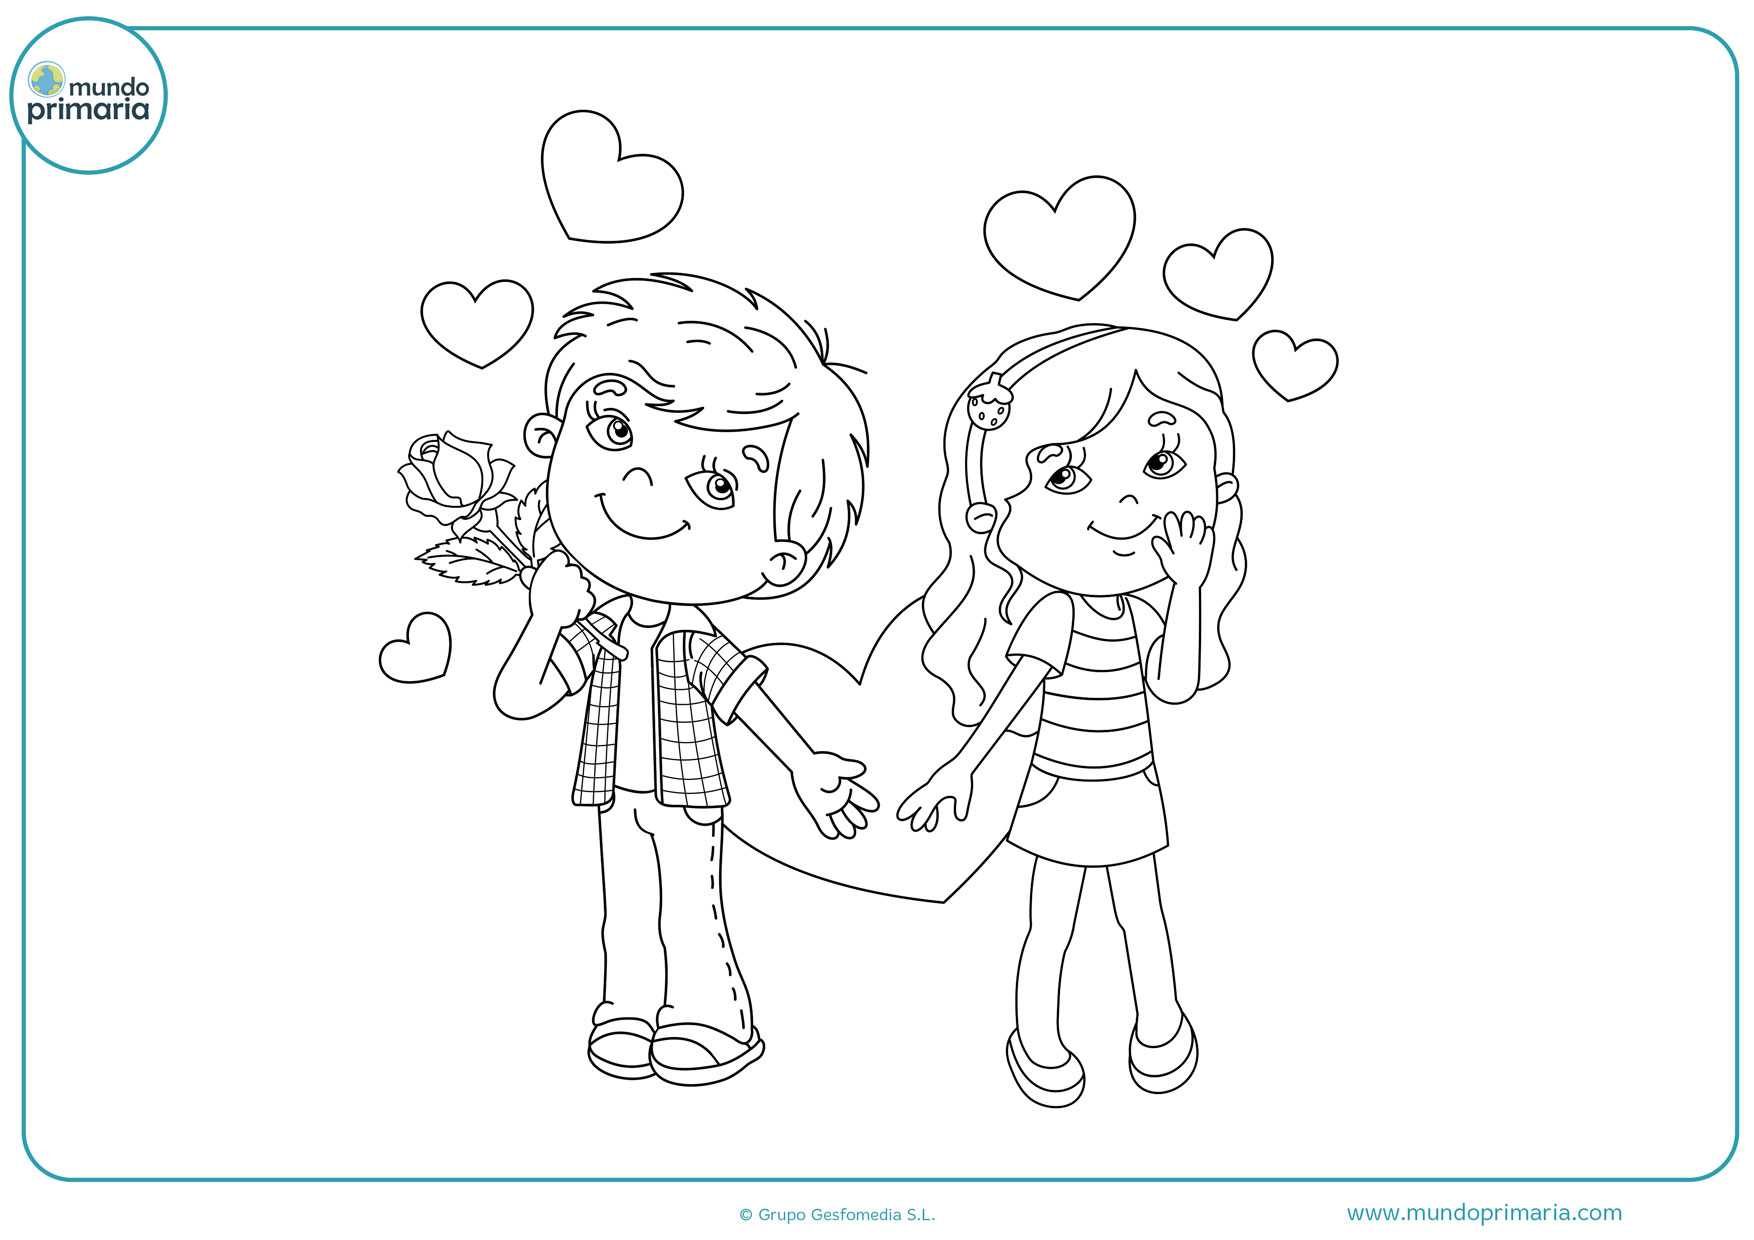 Imagenes Para Pintar San Valentin Dibujo De Niños De San Valentín